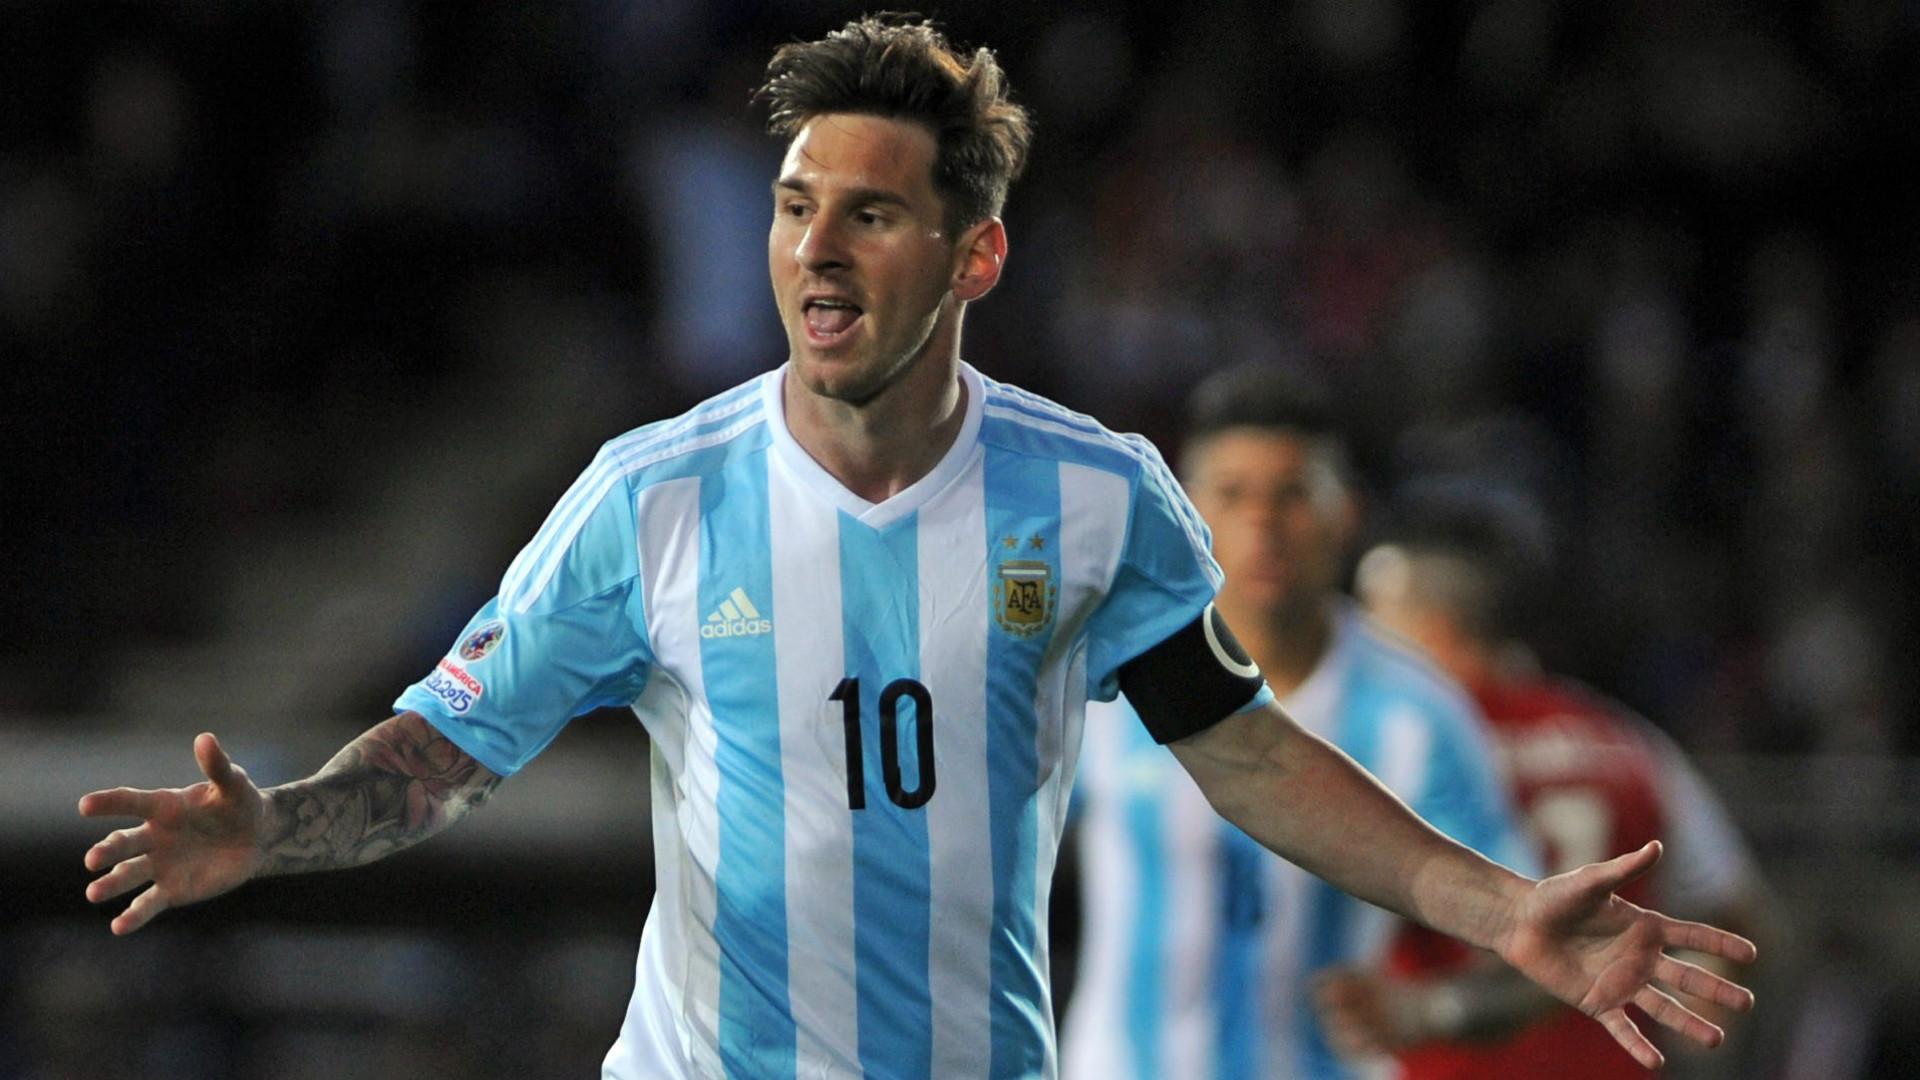 Lo soltaron gracias a Messi